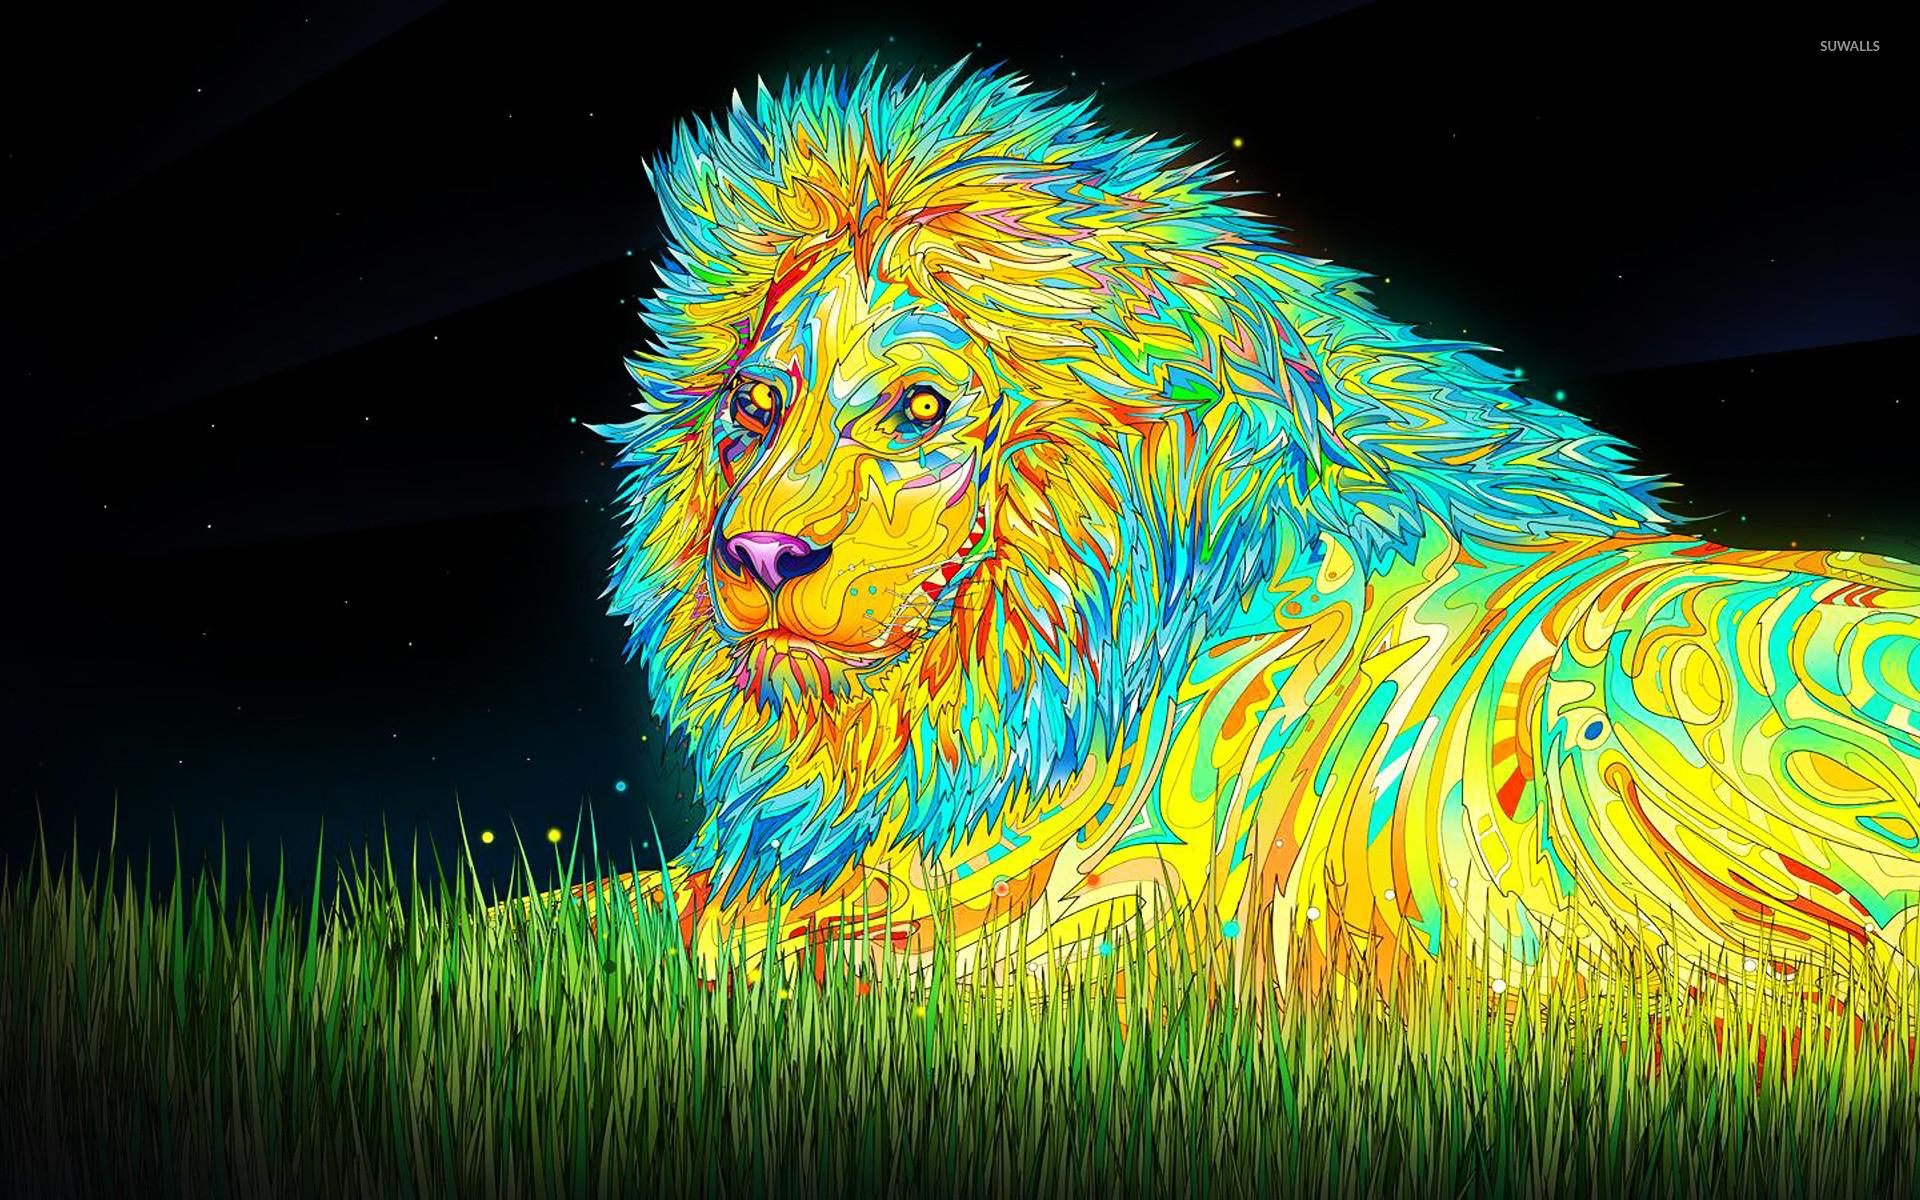 Psychoactive lion wallpaper